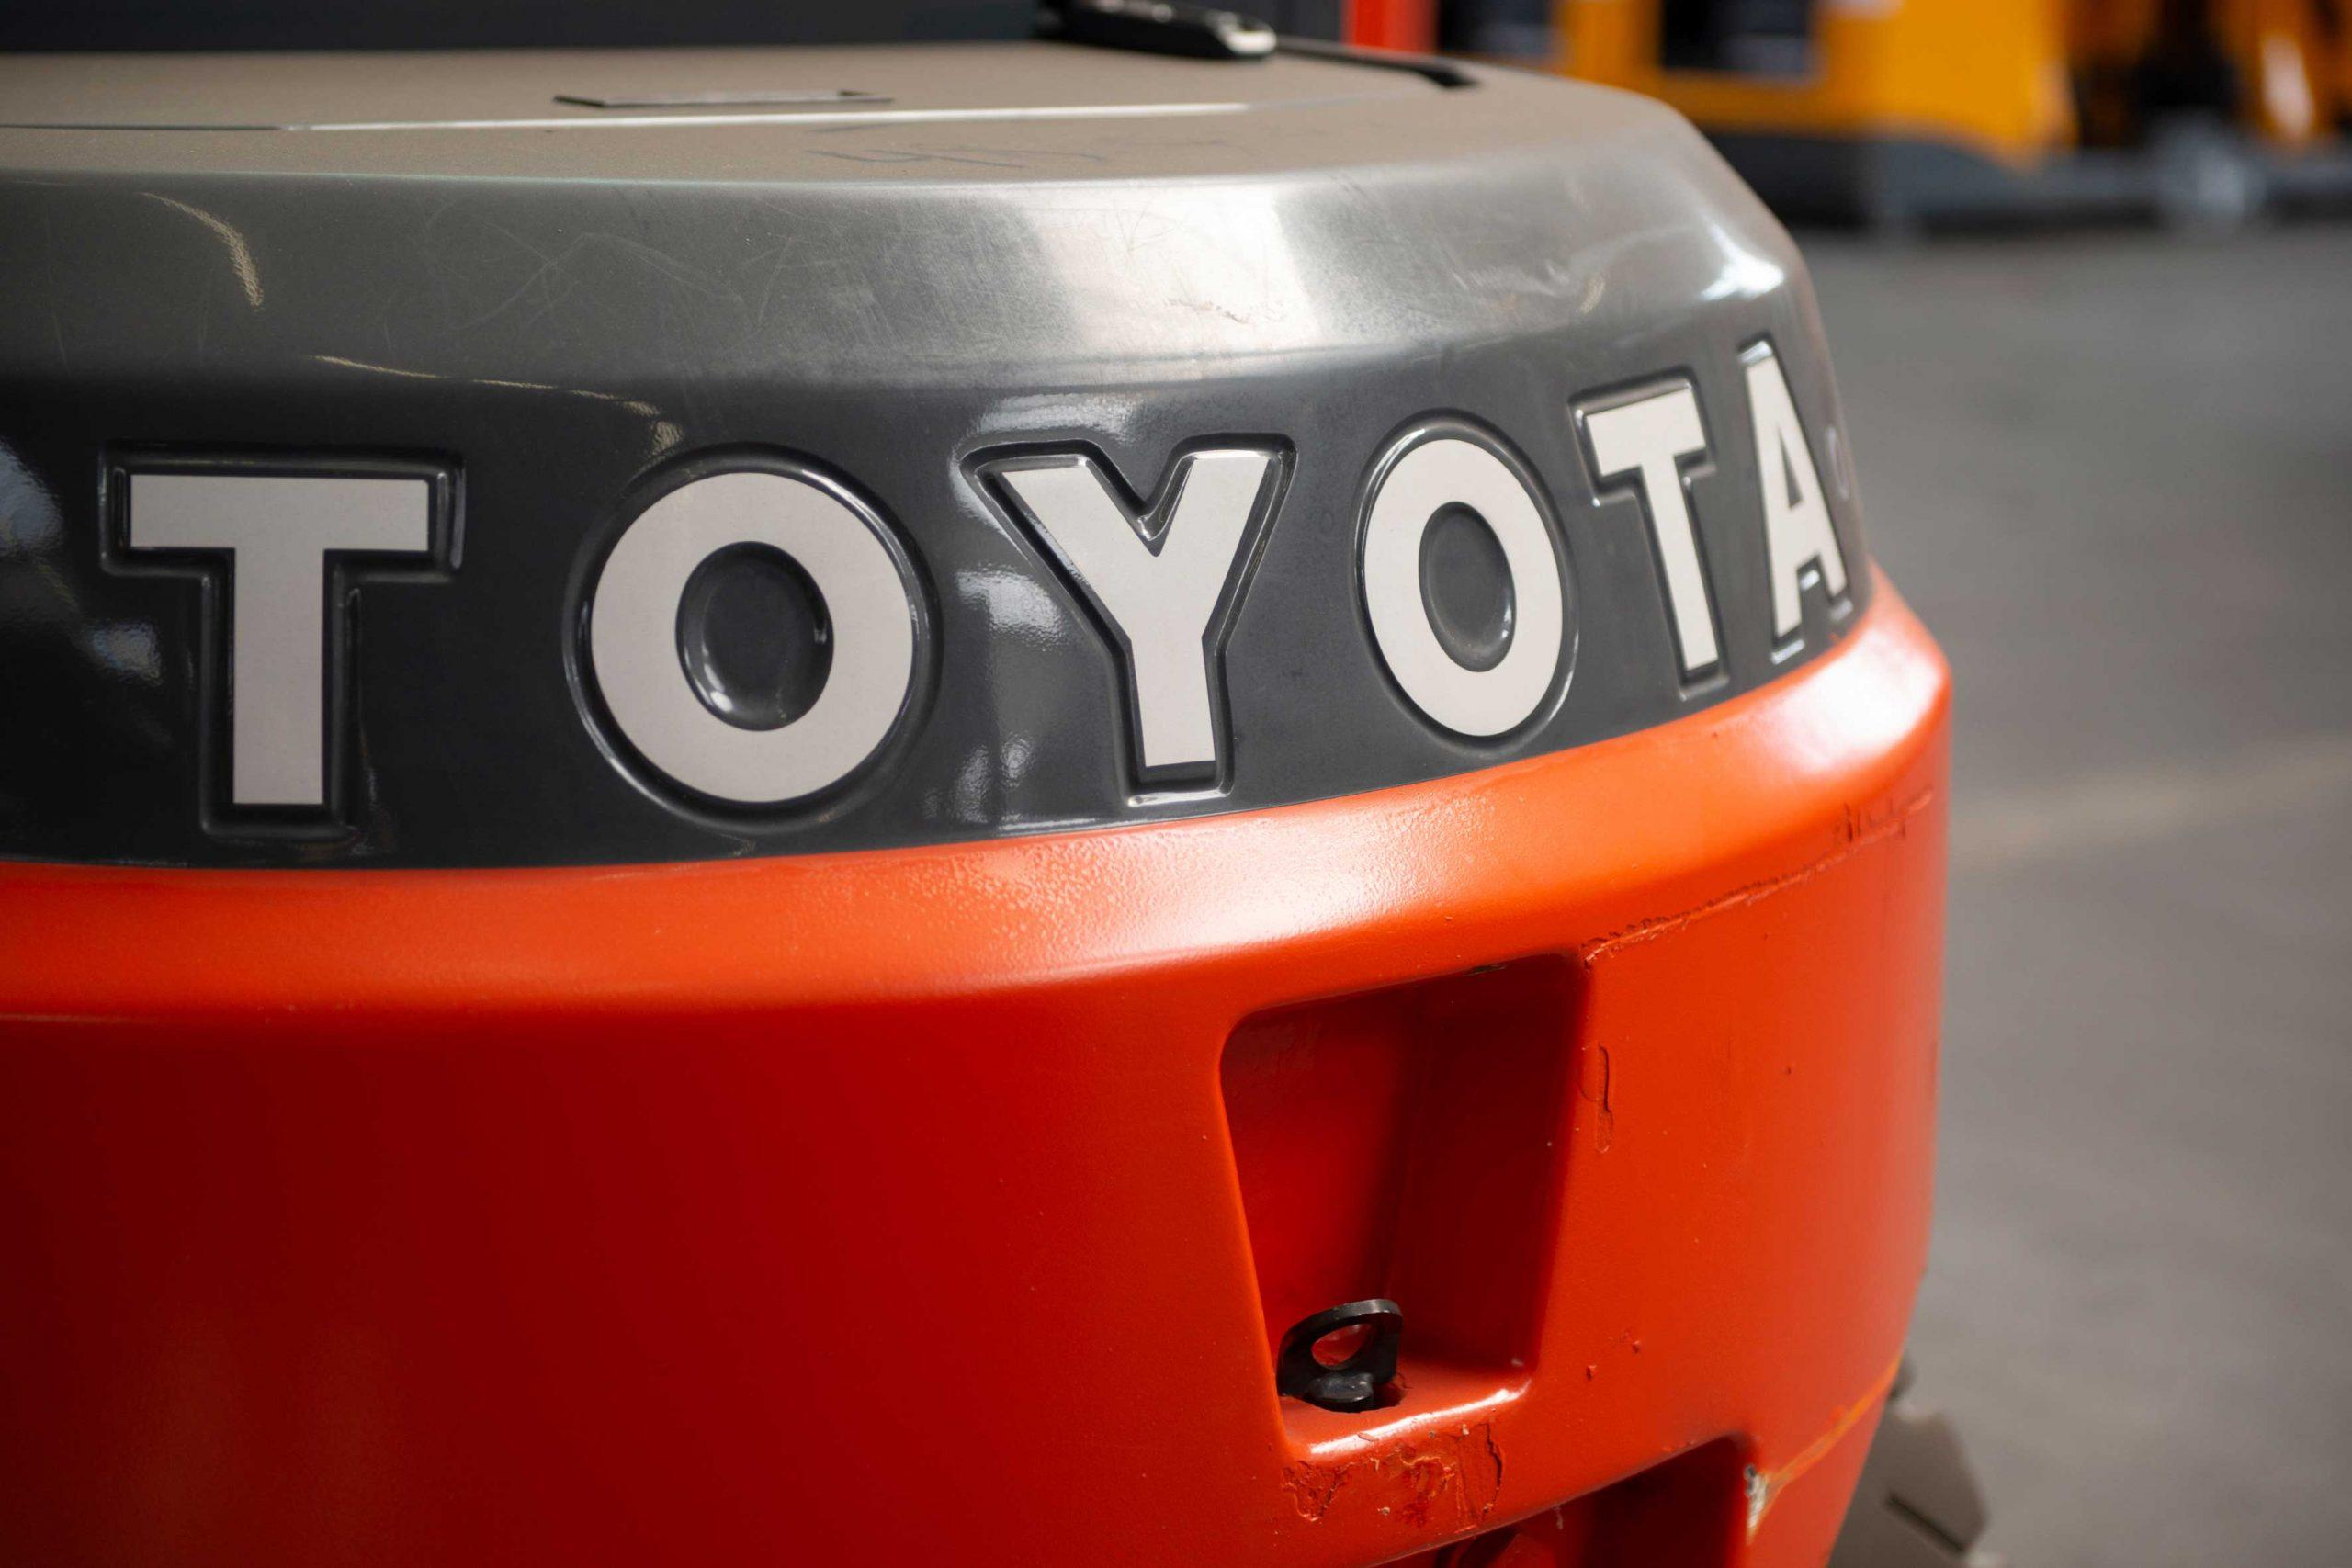 TRAFIK – Toyota - BT 二手叉车